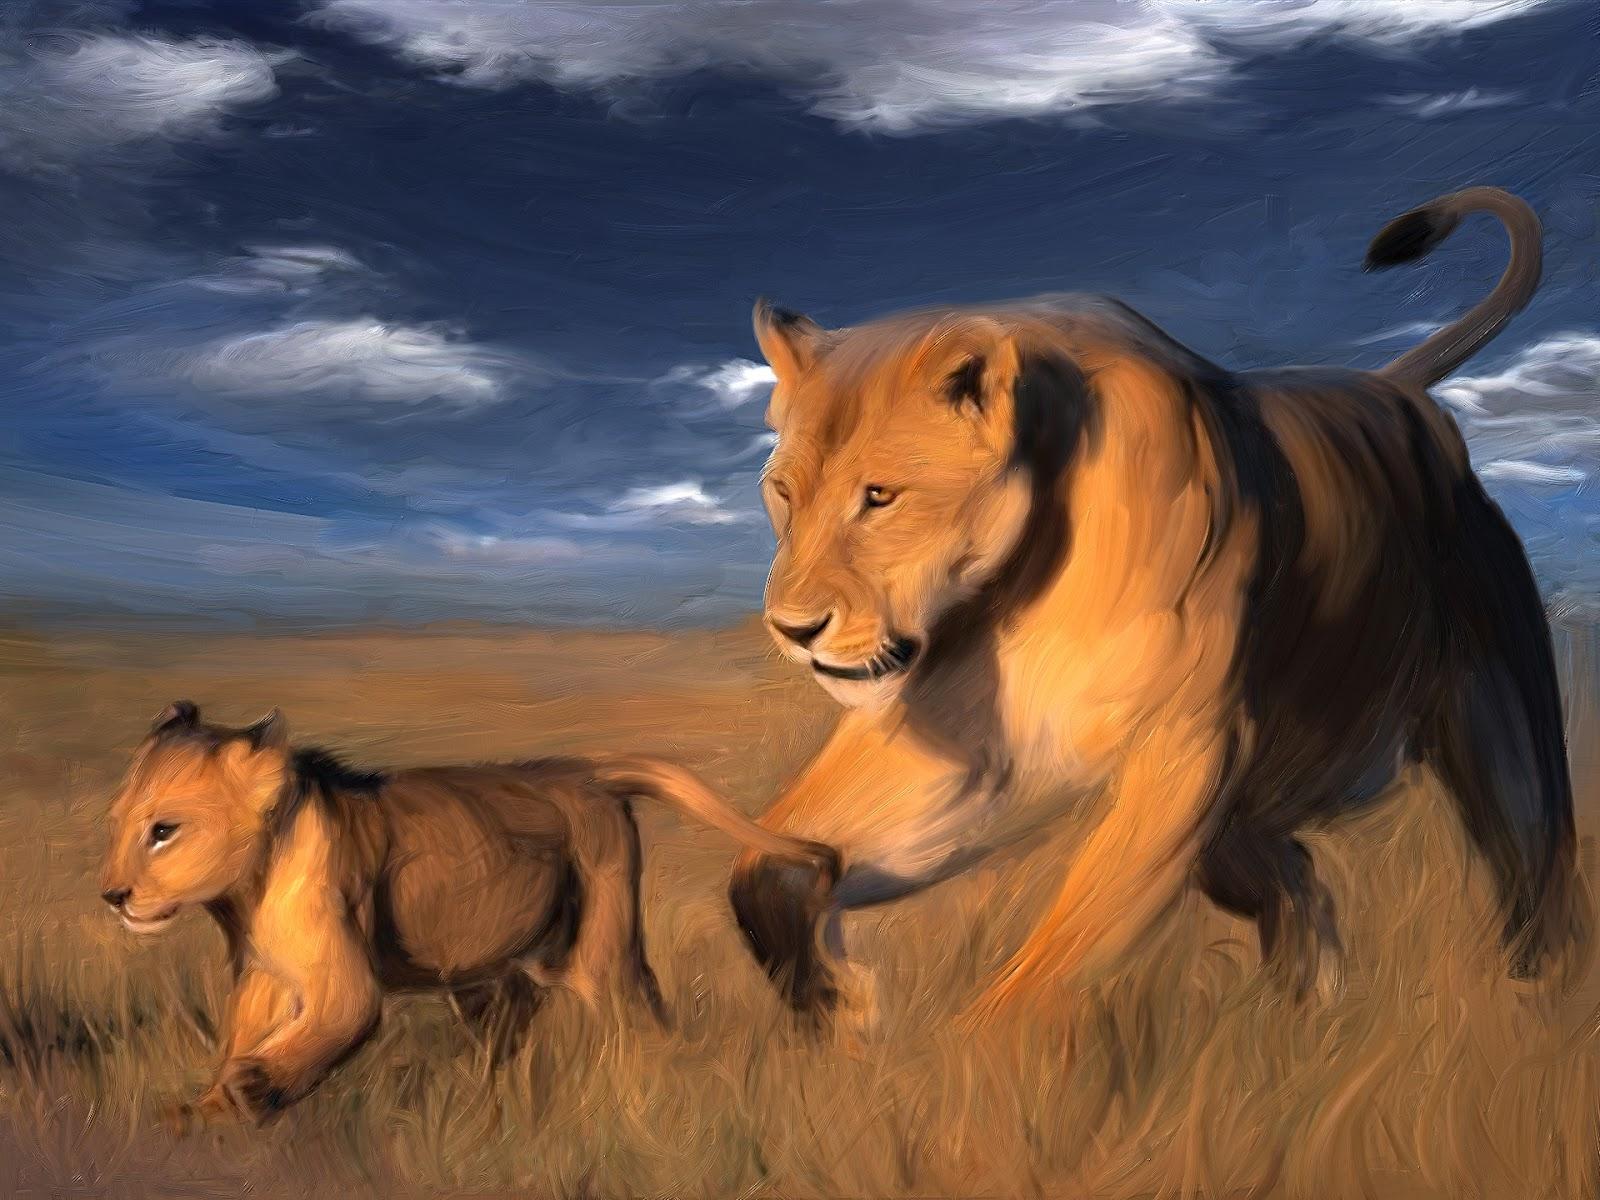 animals wallpapers hd beautiful animals for desktop